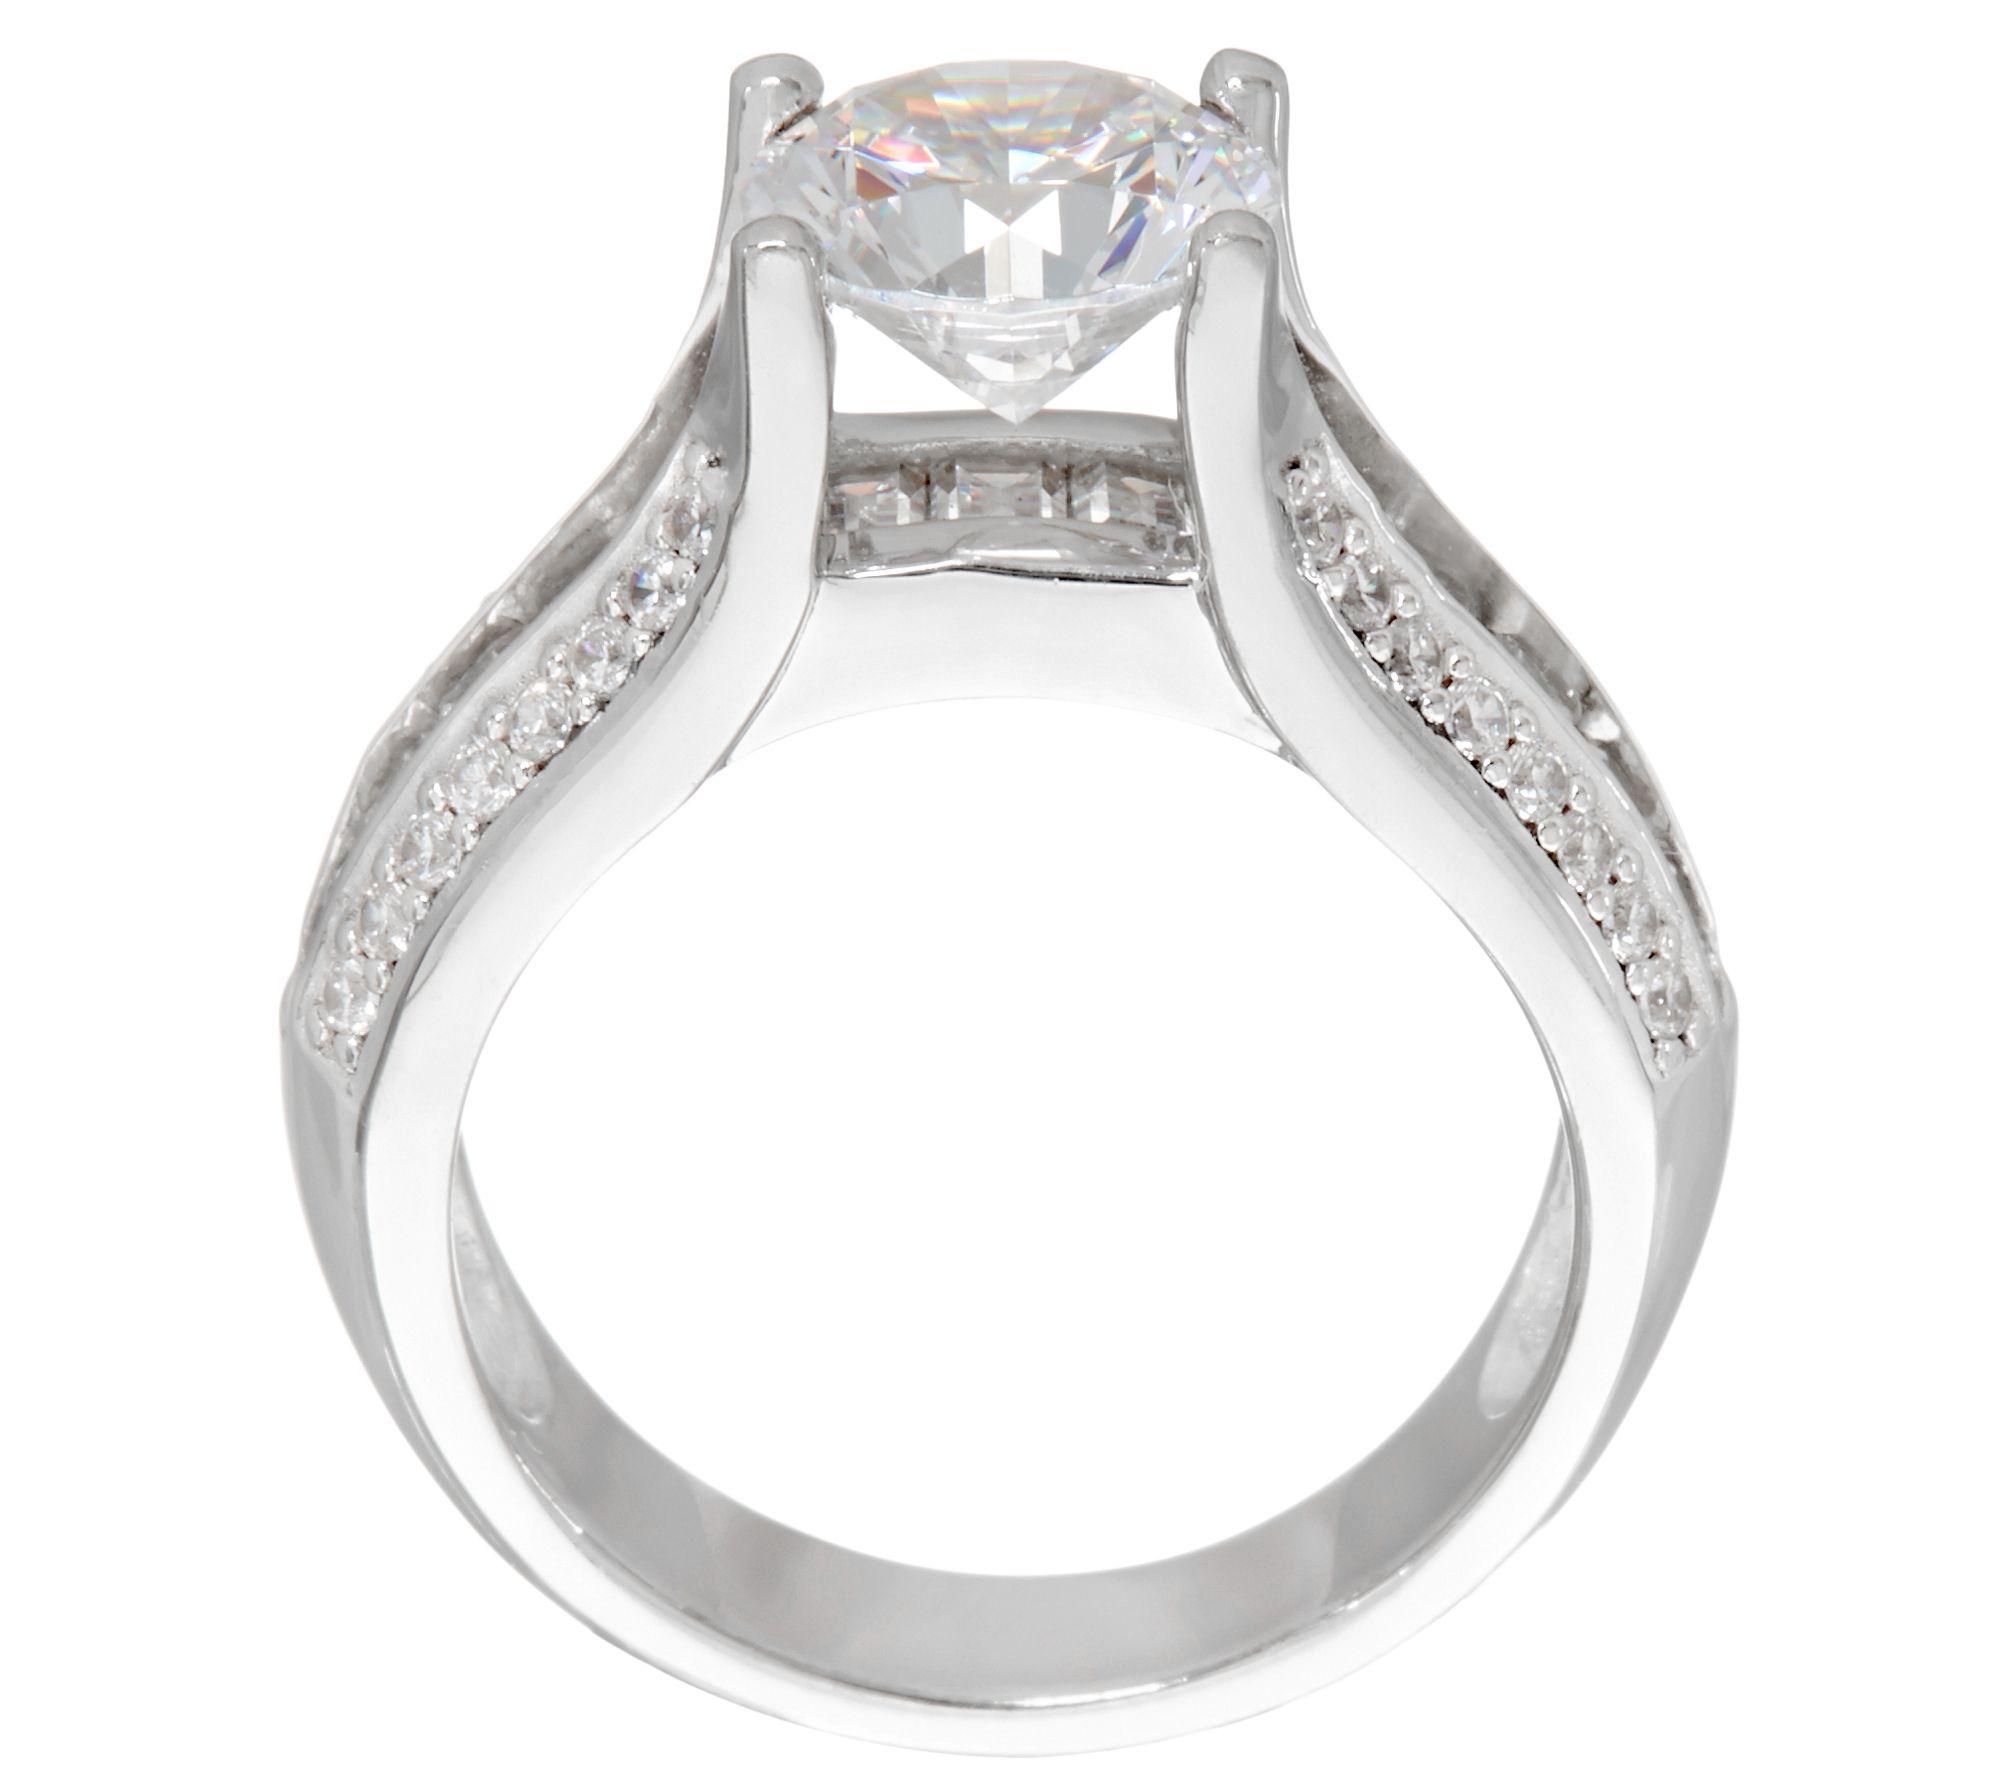 Diamonique 3 10 cttw Bridal Ring Platinum Clad Page 1 — QVC